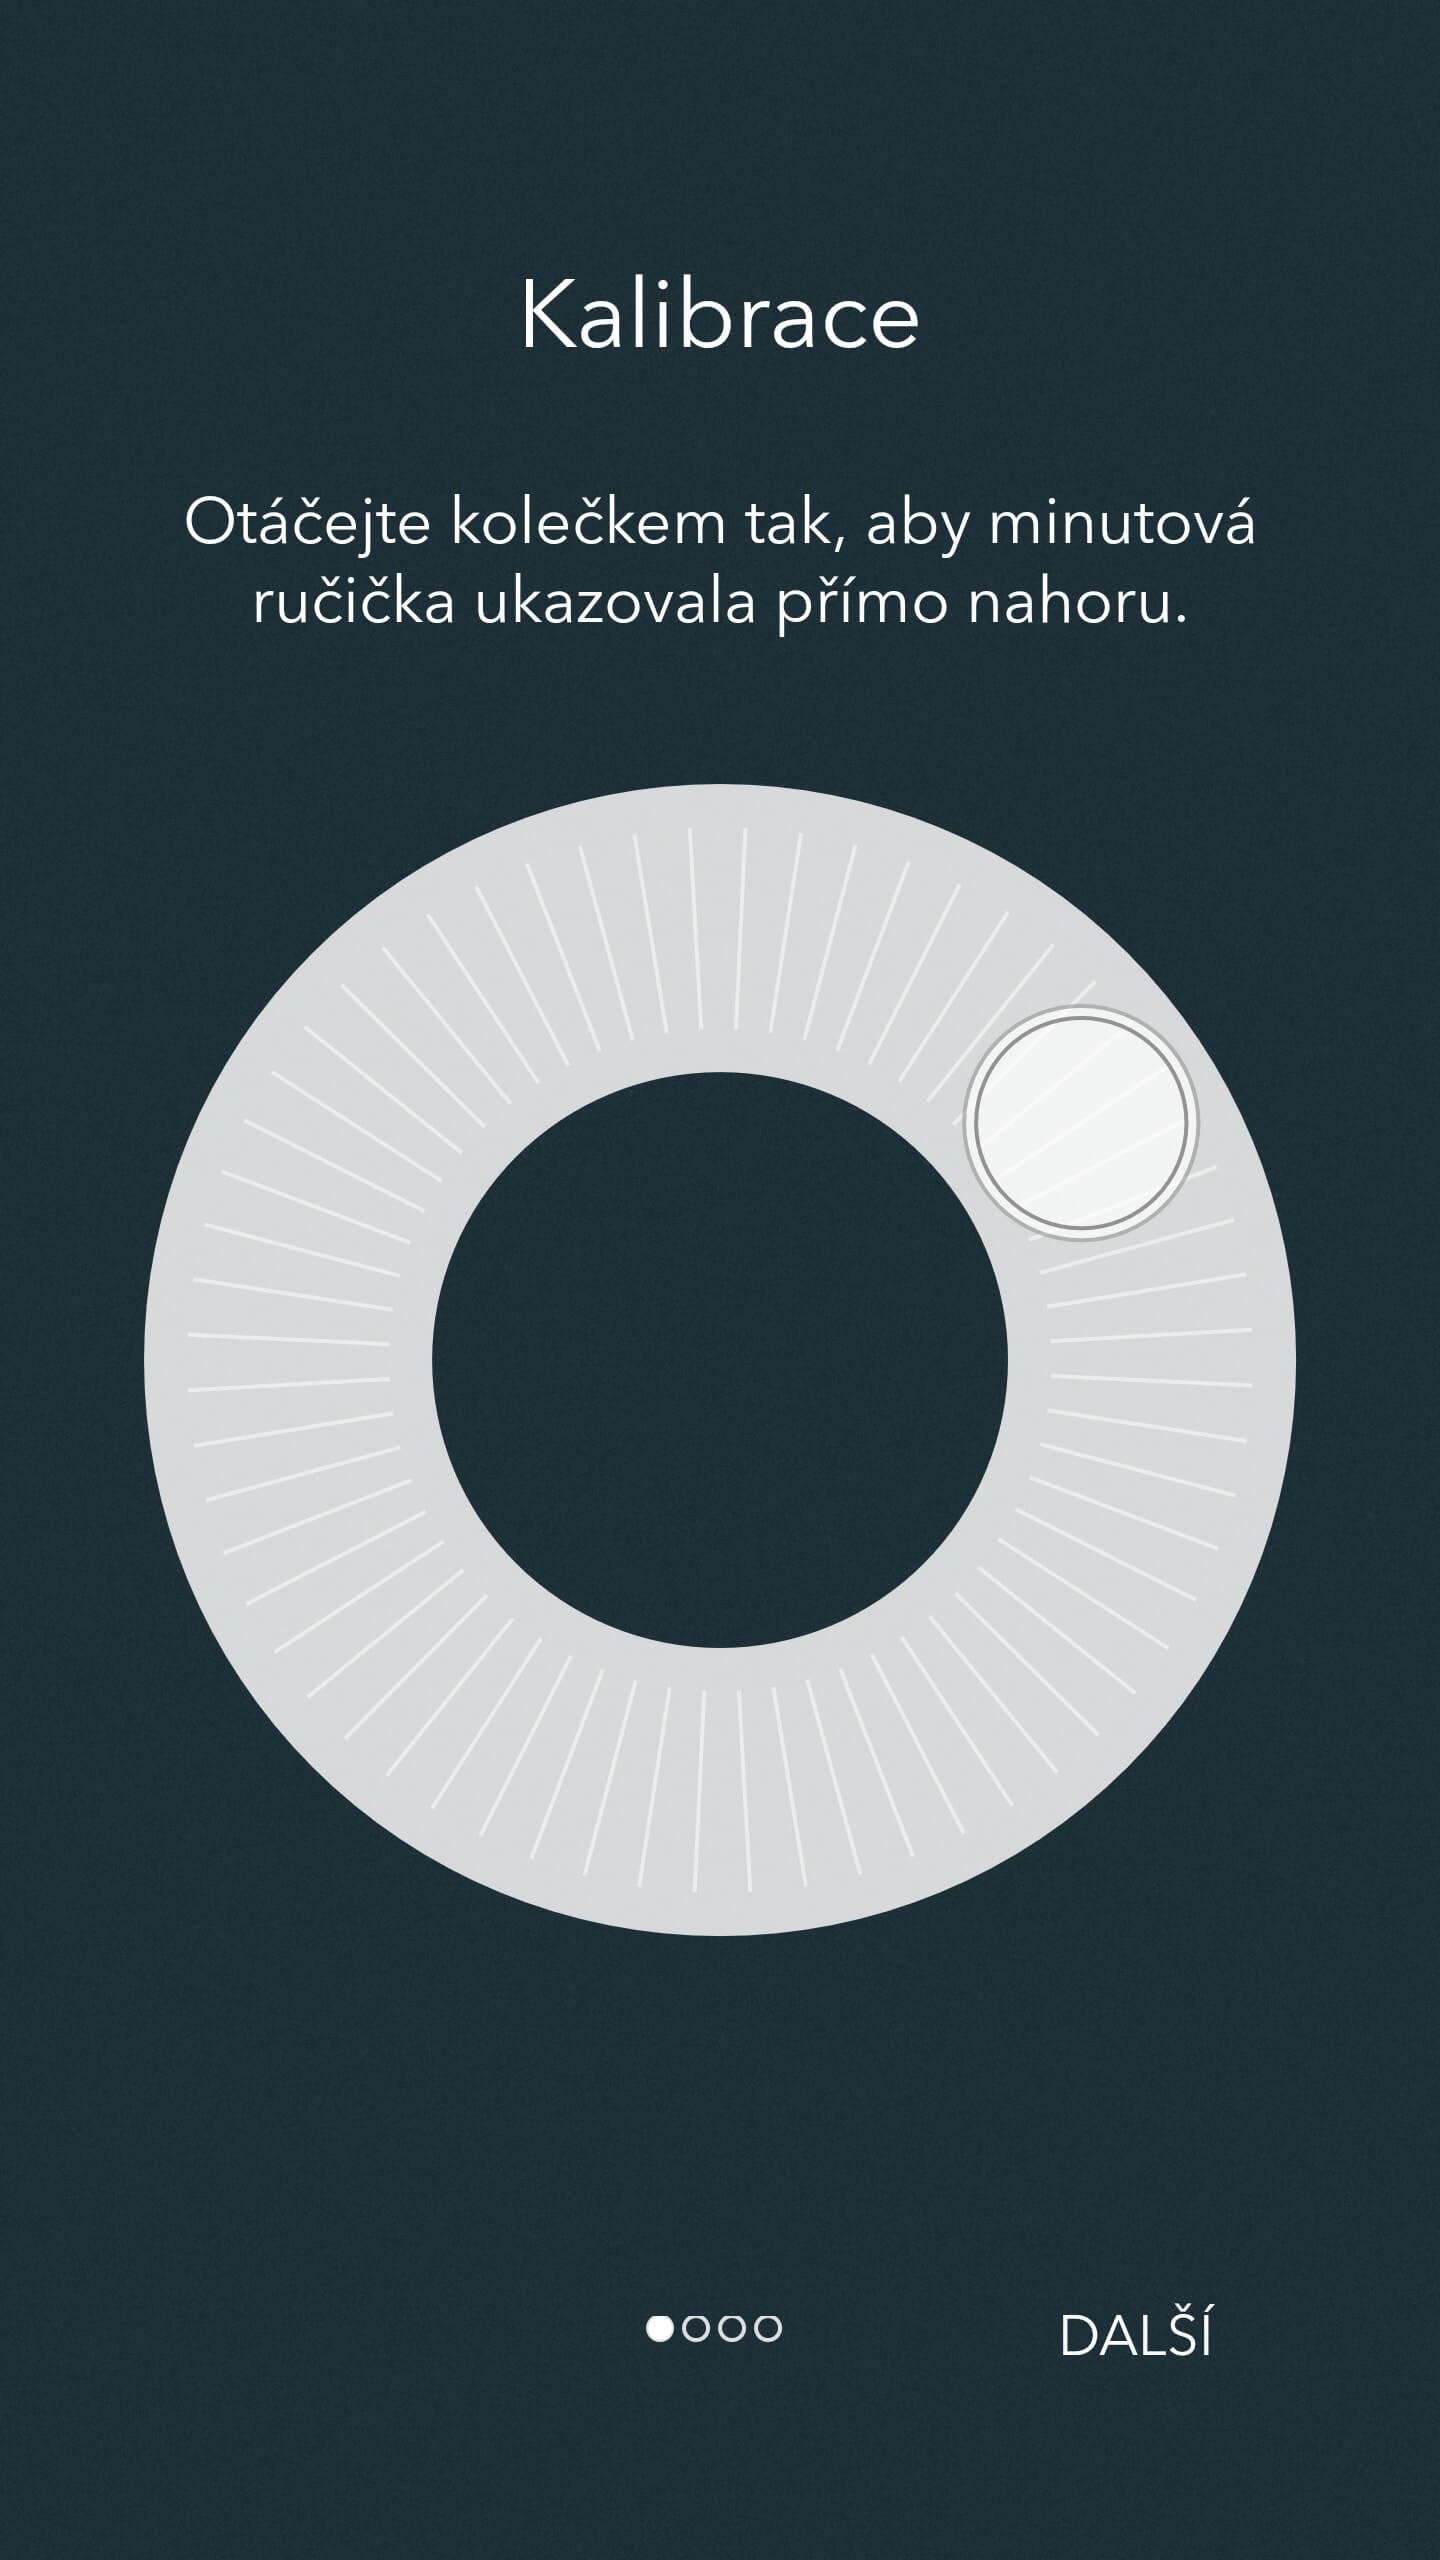 Kronaby chytré hodinky aplikace nastavení